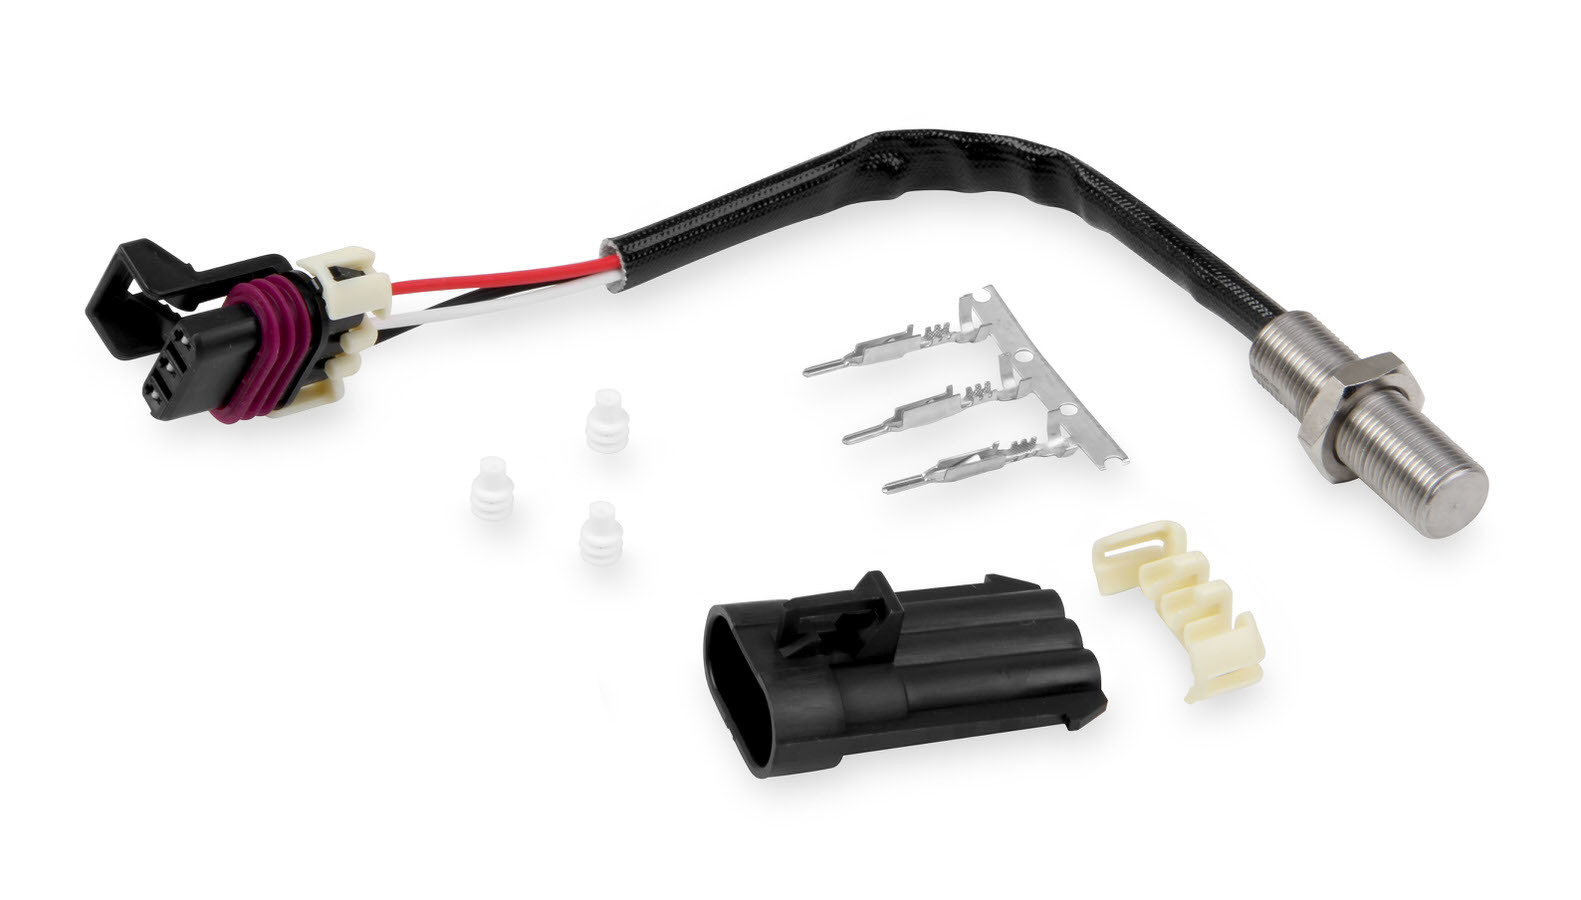 Holley 554-125 Cam Position Sensor, 12 x 1 mm Thread, Flying Magnet, Holley EFI Kits, Kit